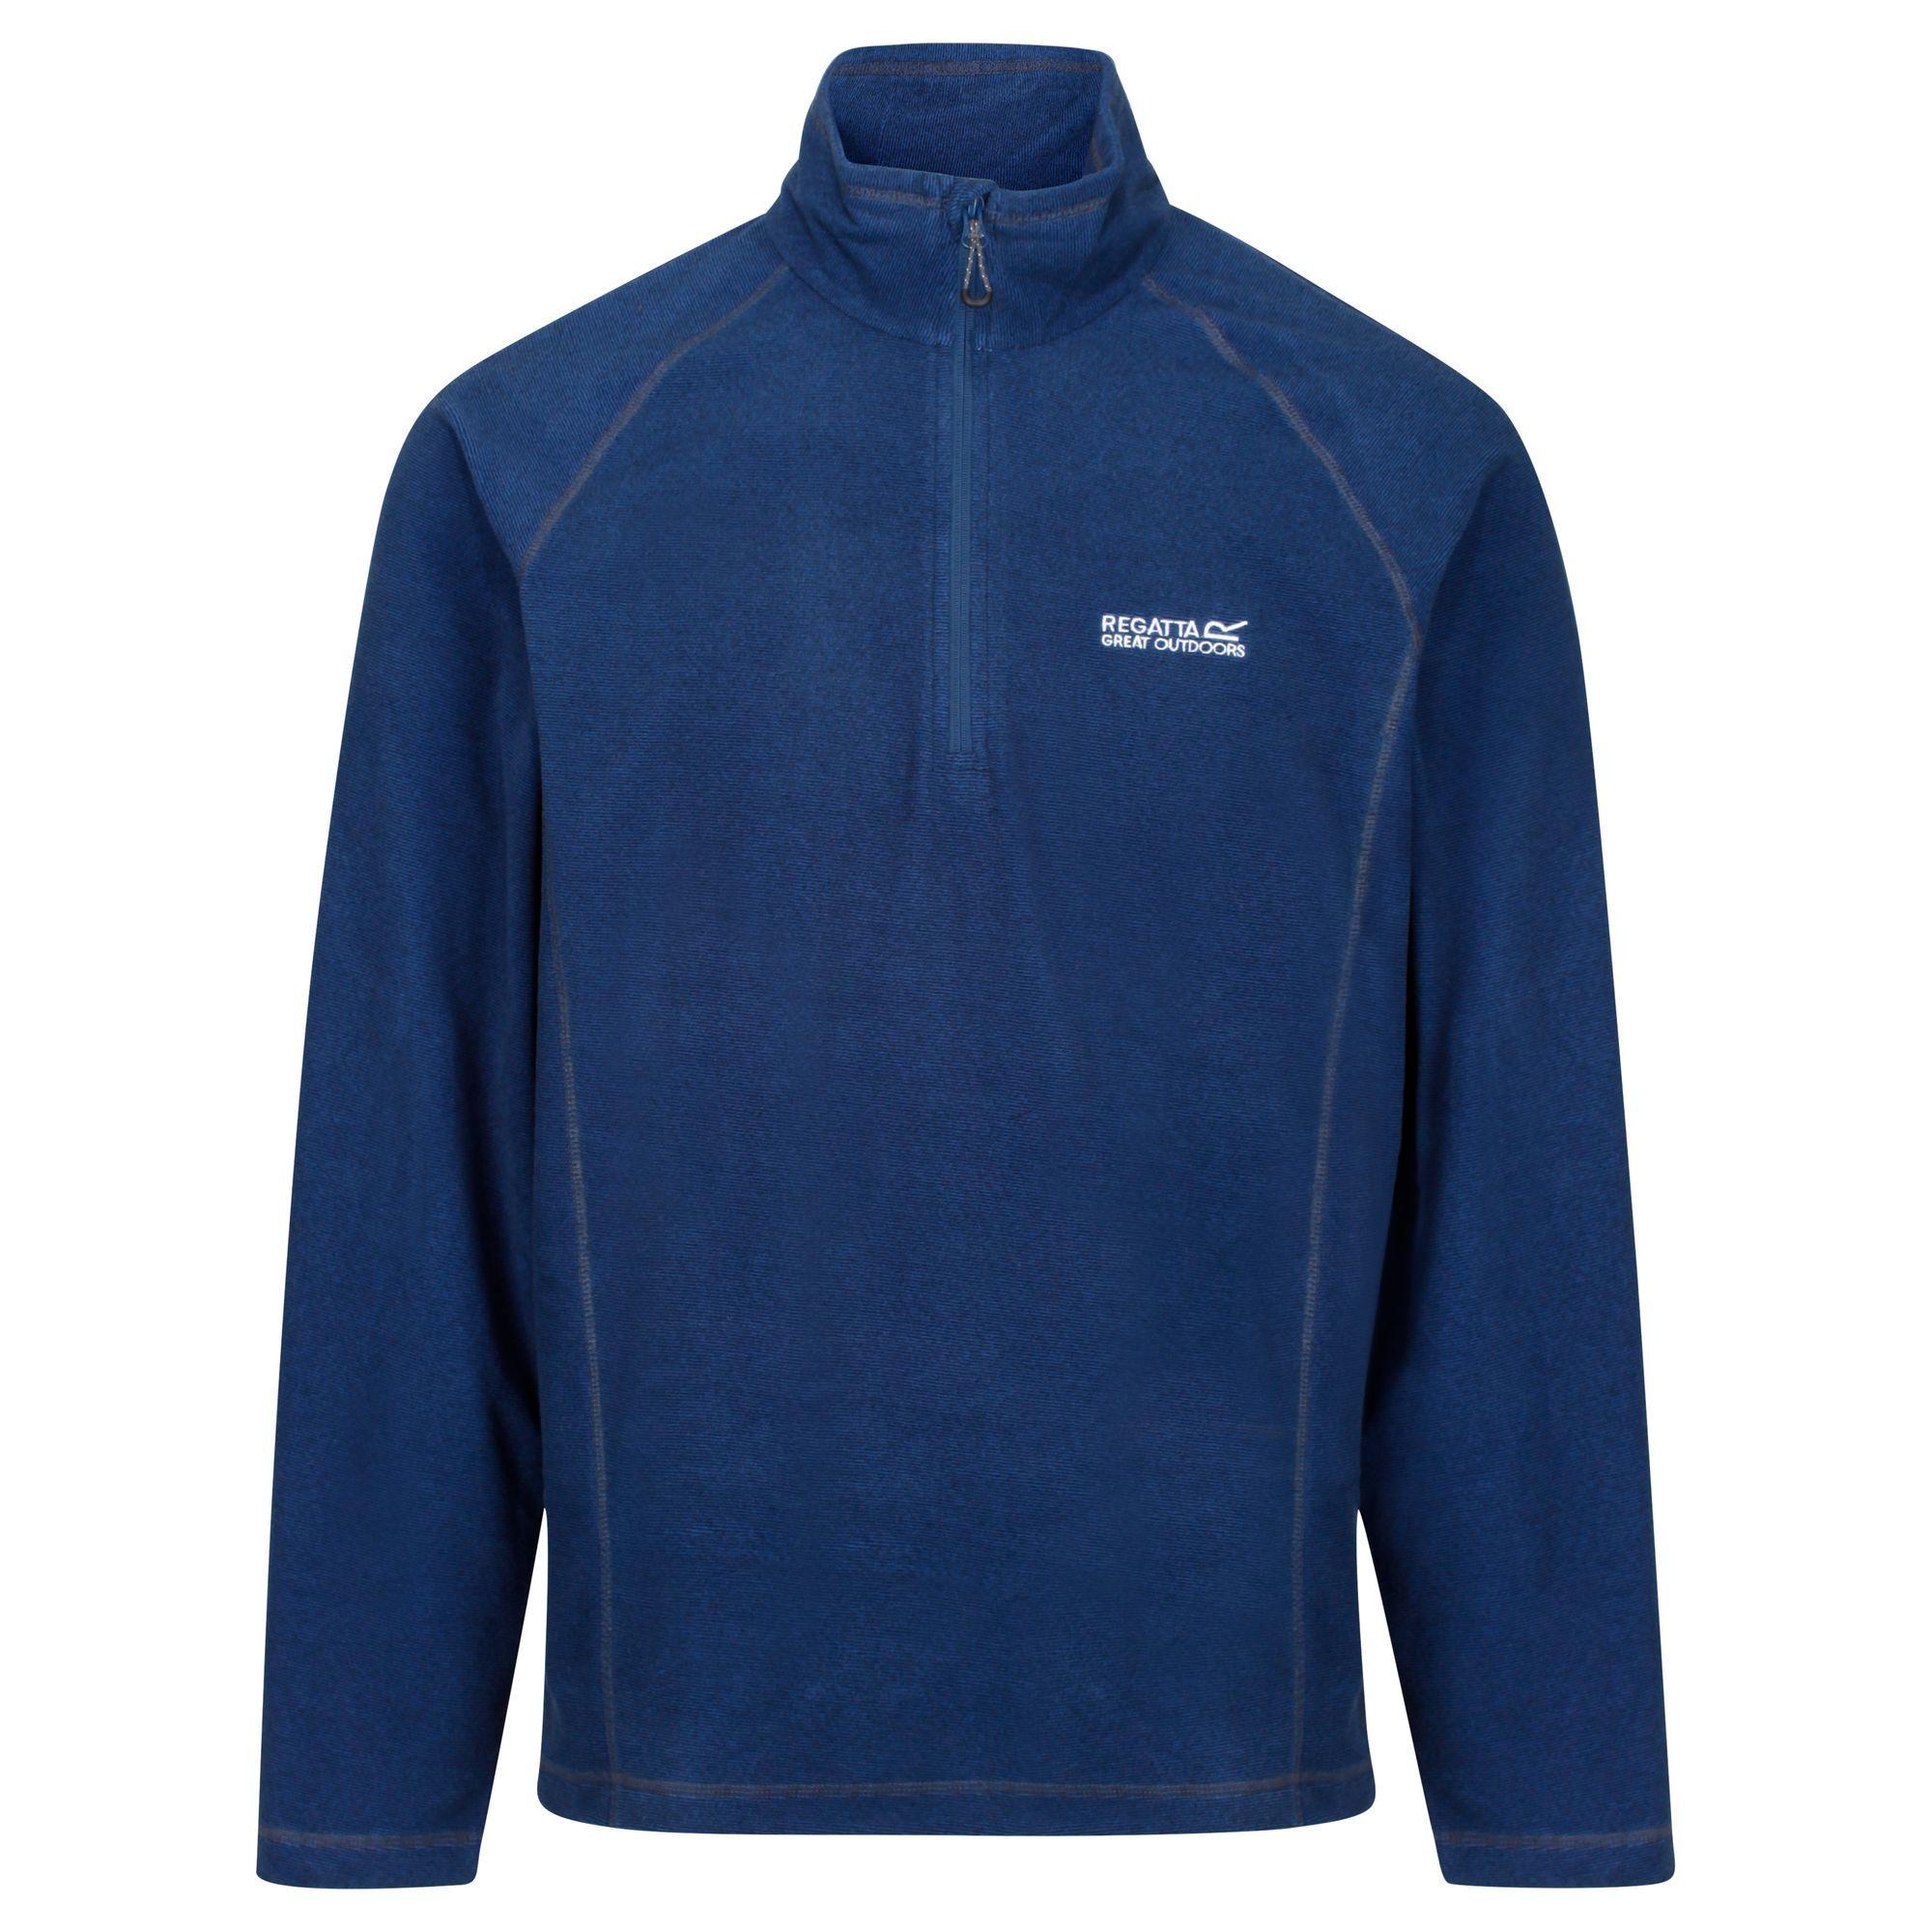 Regatta-Mens-Fleece-Jacket-amp-Hoodie-Massive-Clearance-RRP-60 thumbnail 57